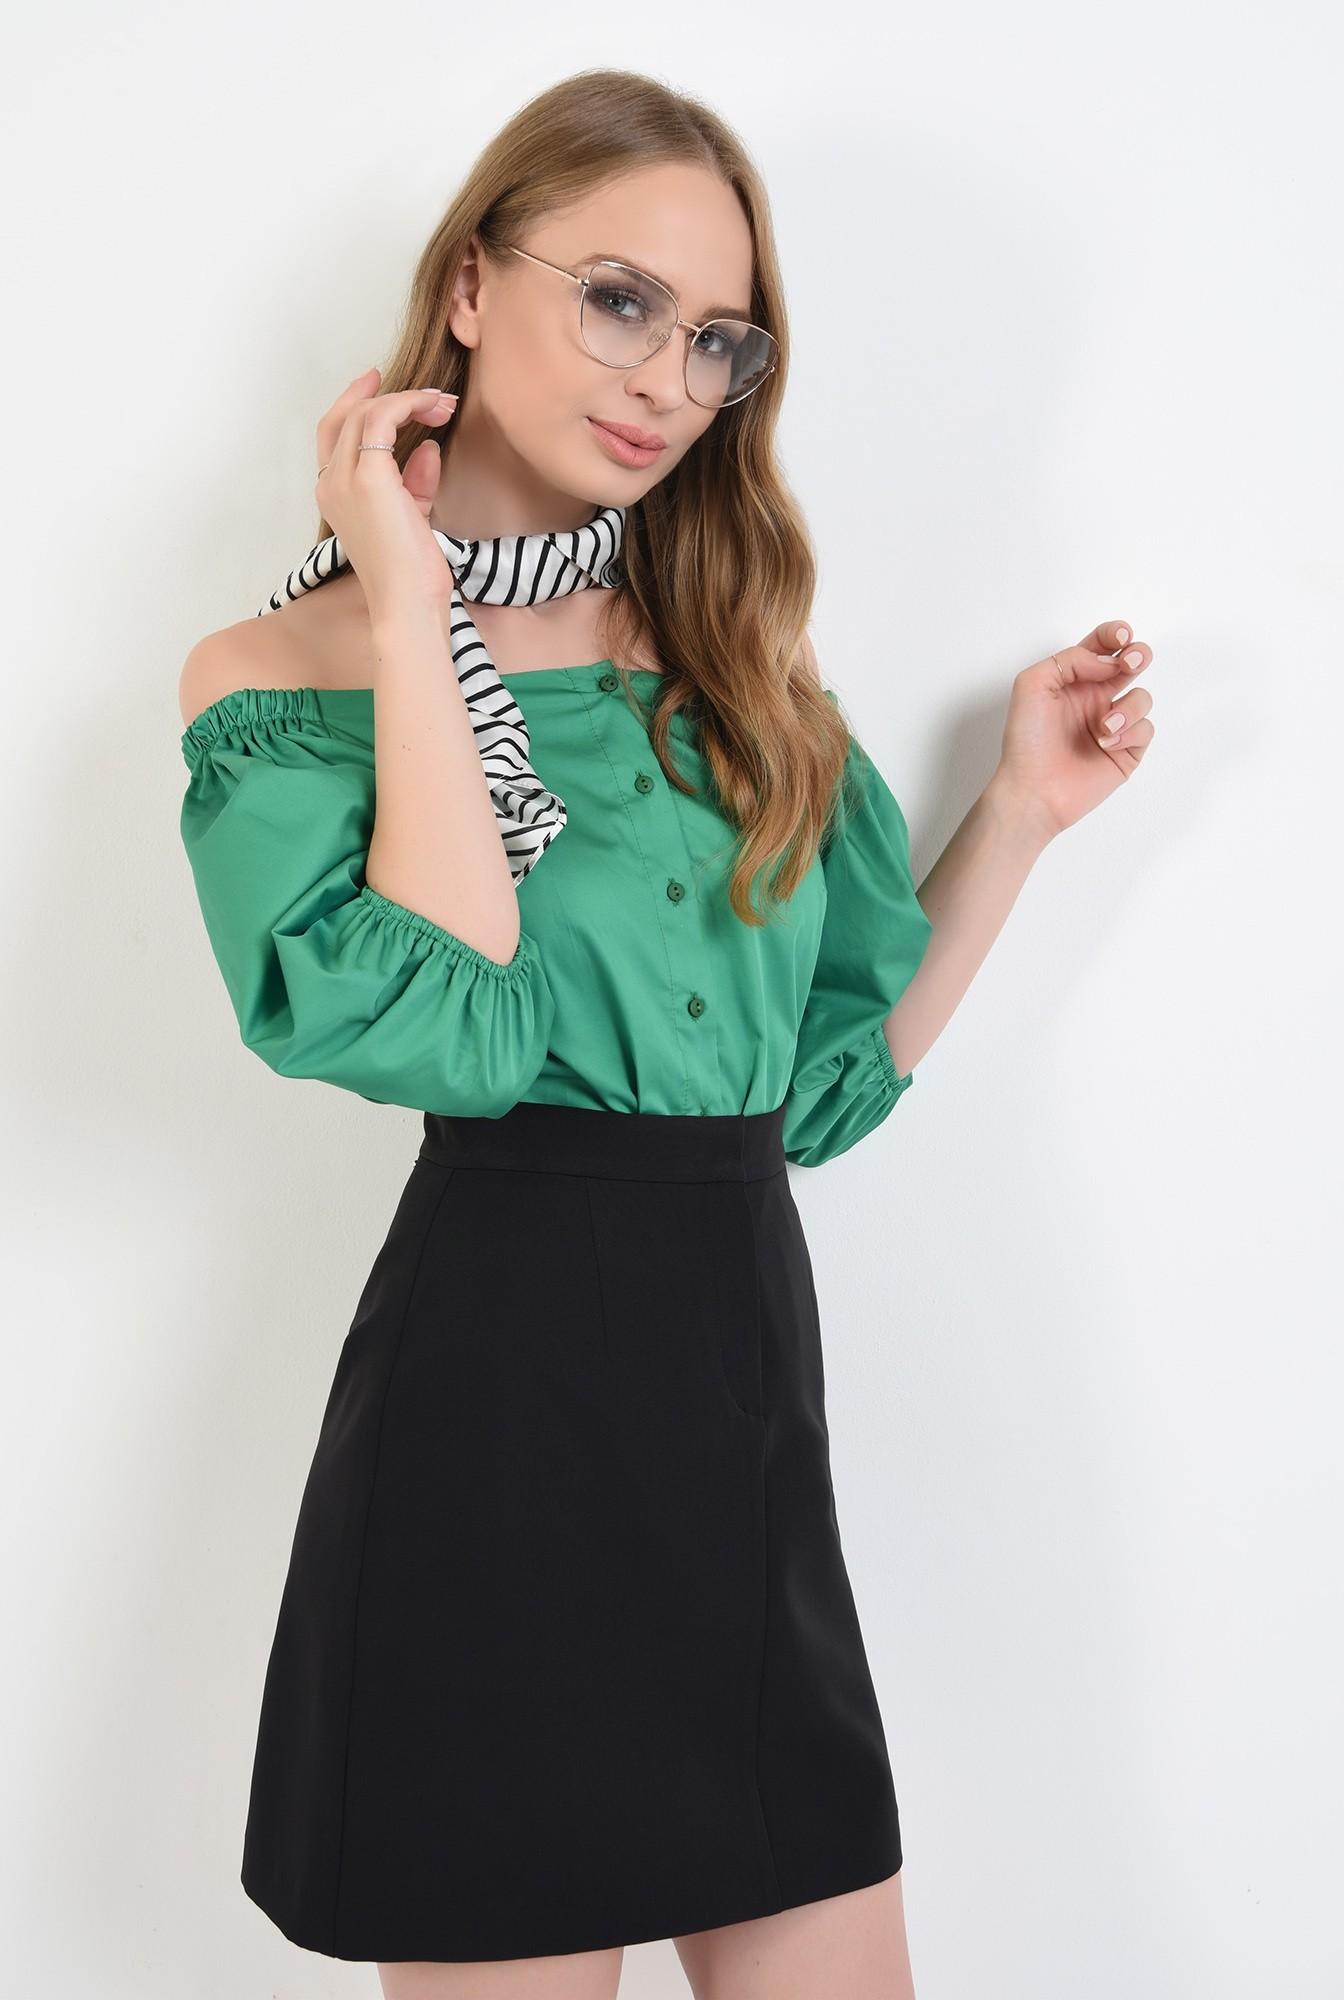 0 - 360 - bluza din bumbac, cu nasturi, verde, Poema